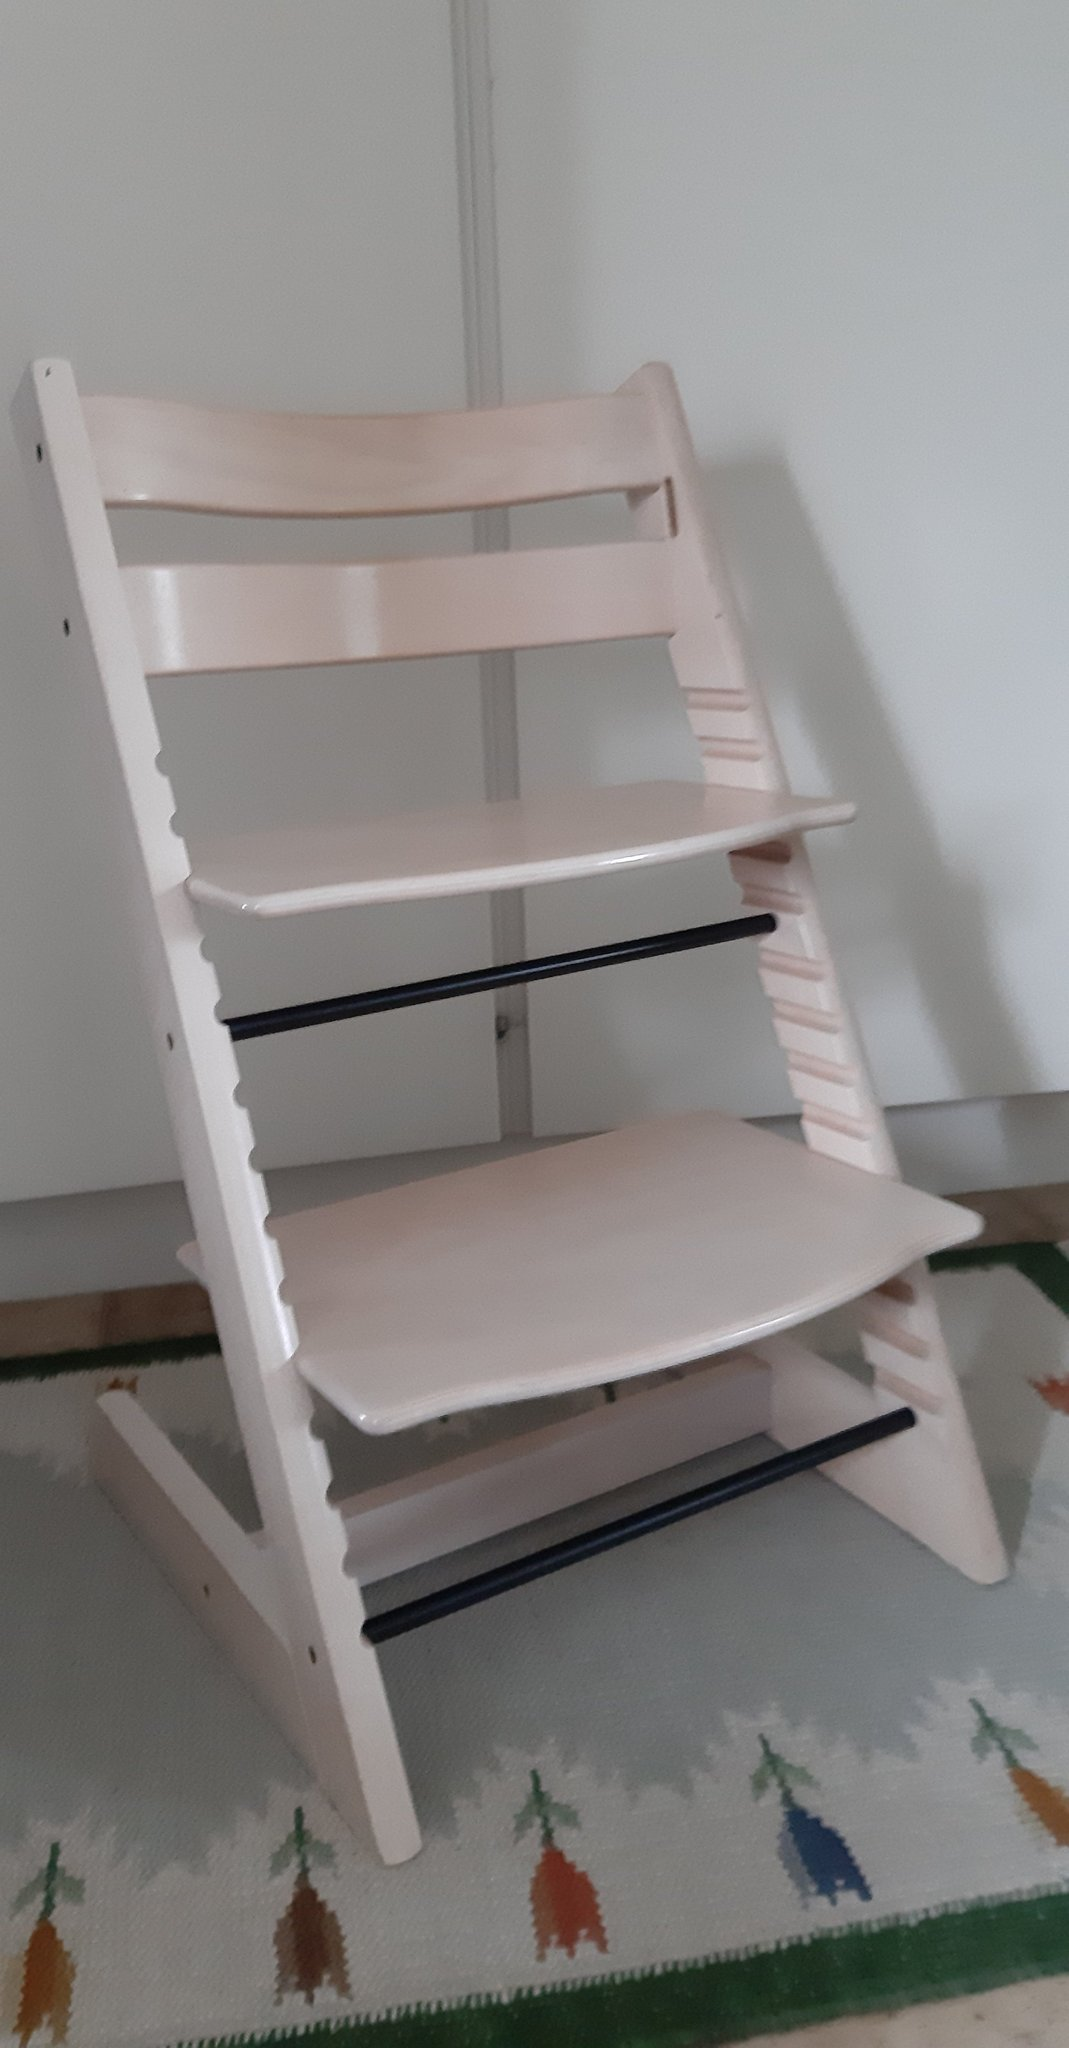 Stokke tripp trapp, stol i ljust trä, vitlaserad (411184440